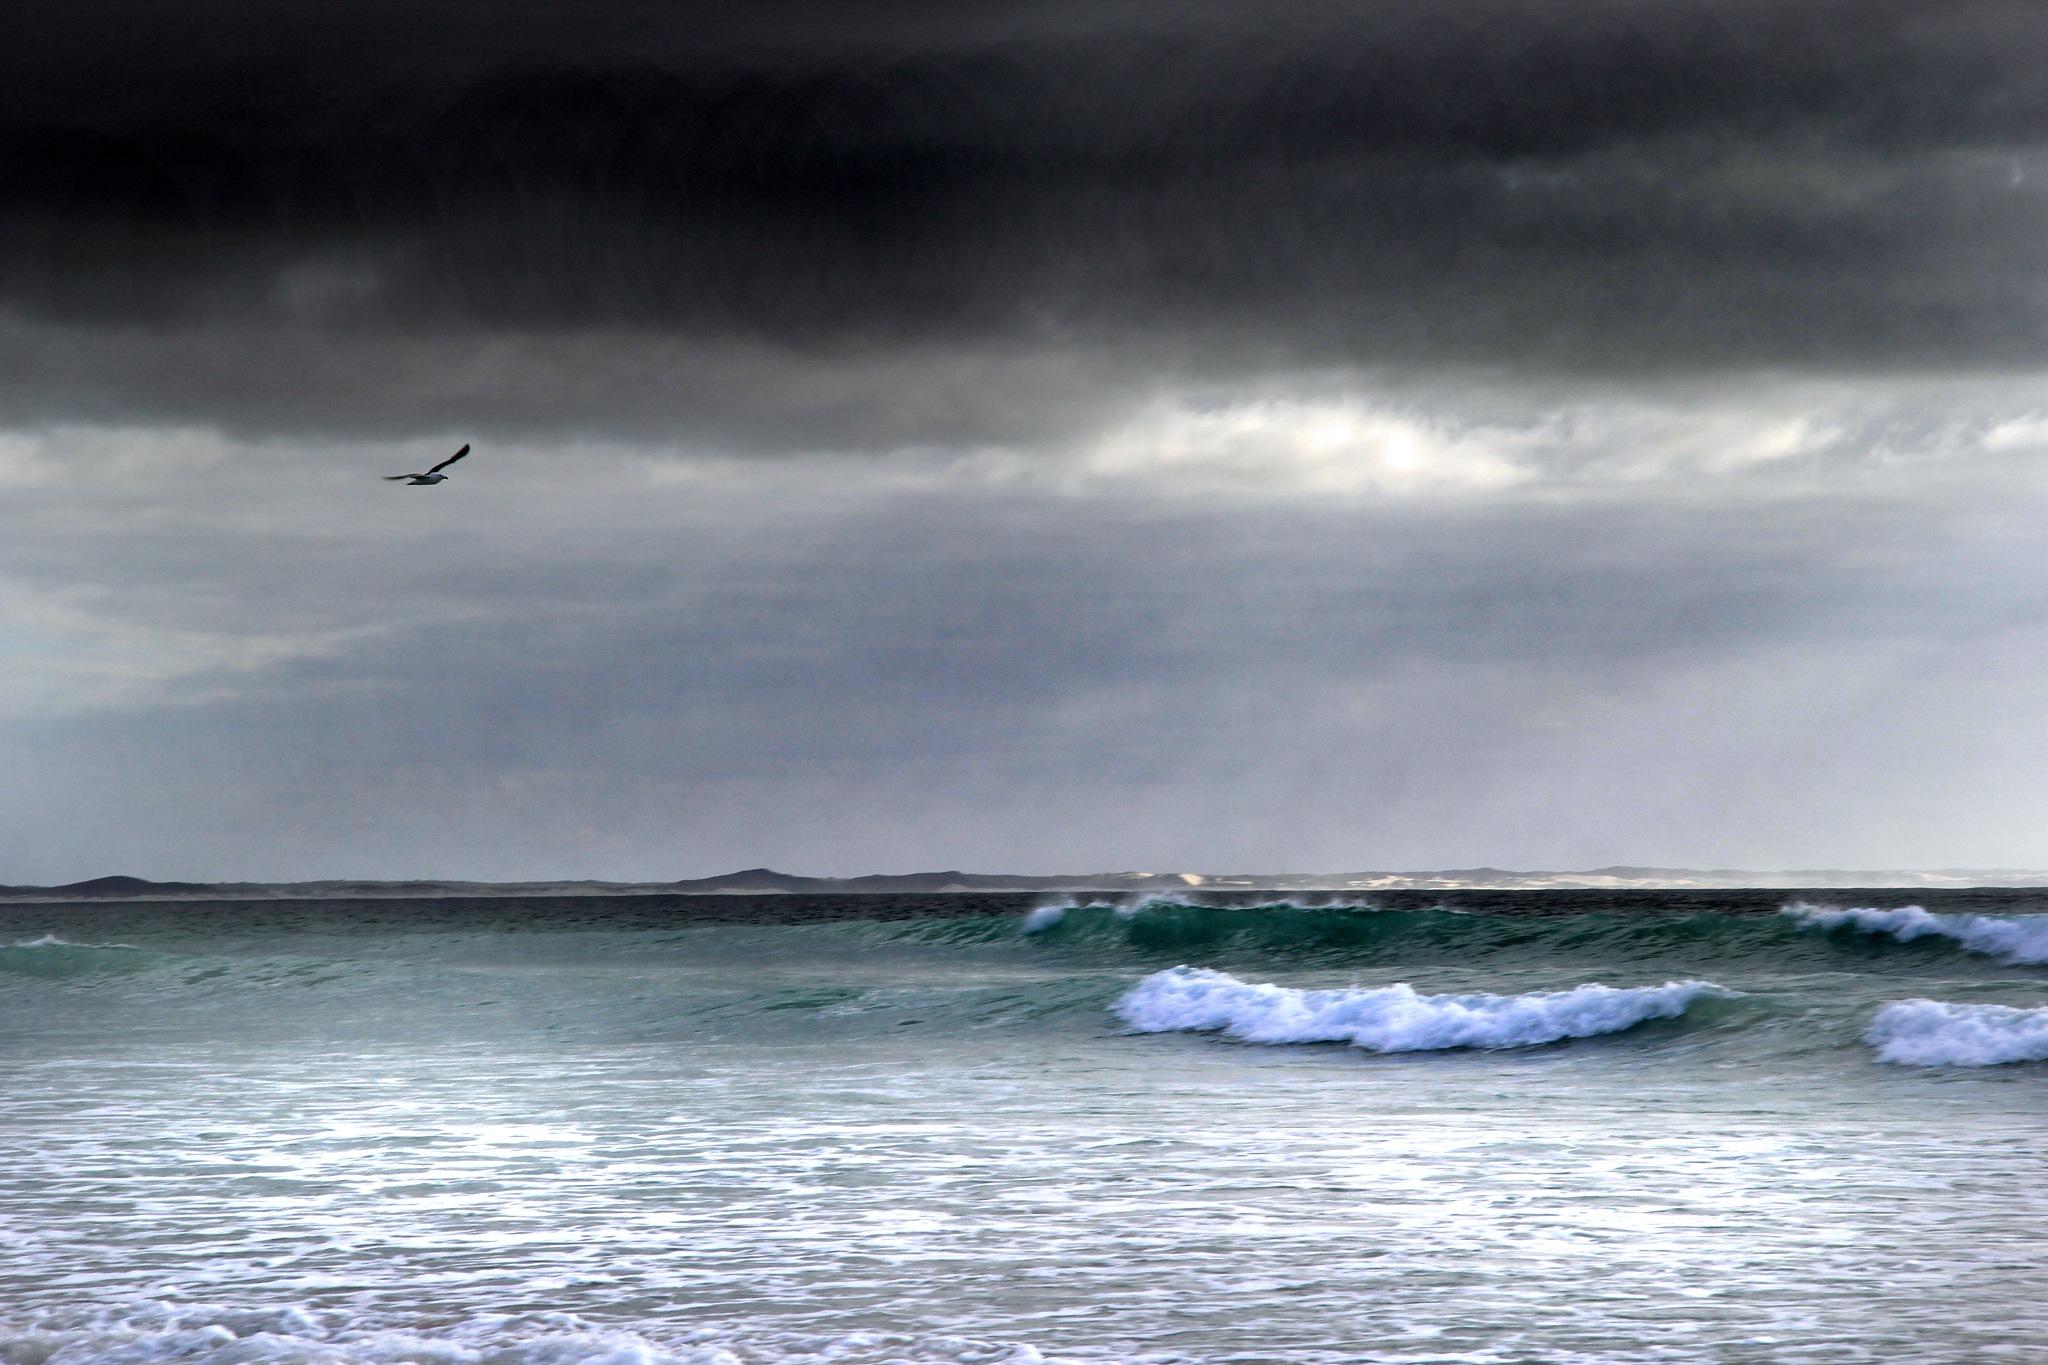 Seagull in flight by Nauta Piscatorque